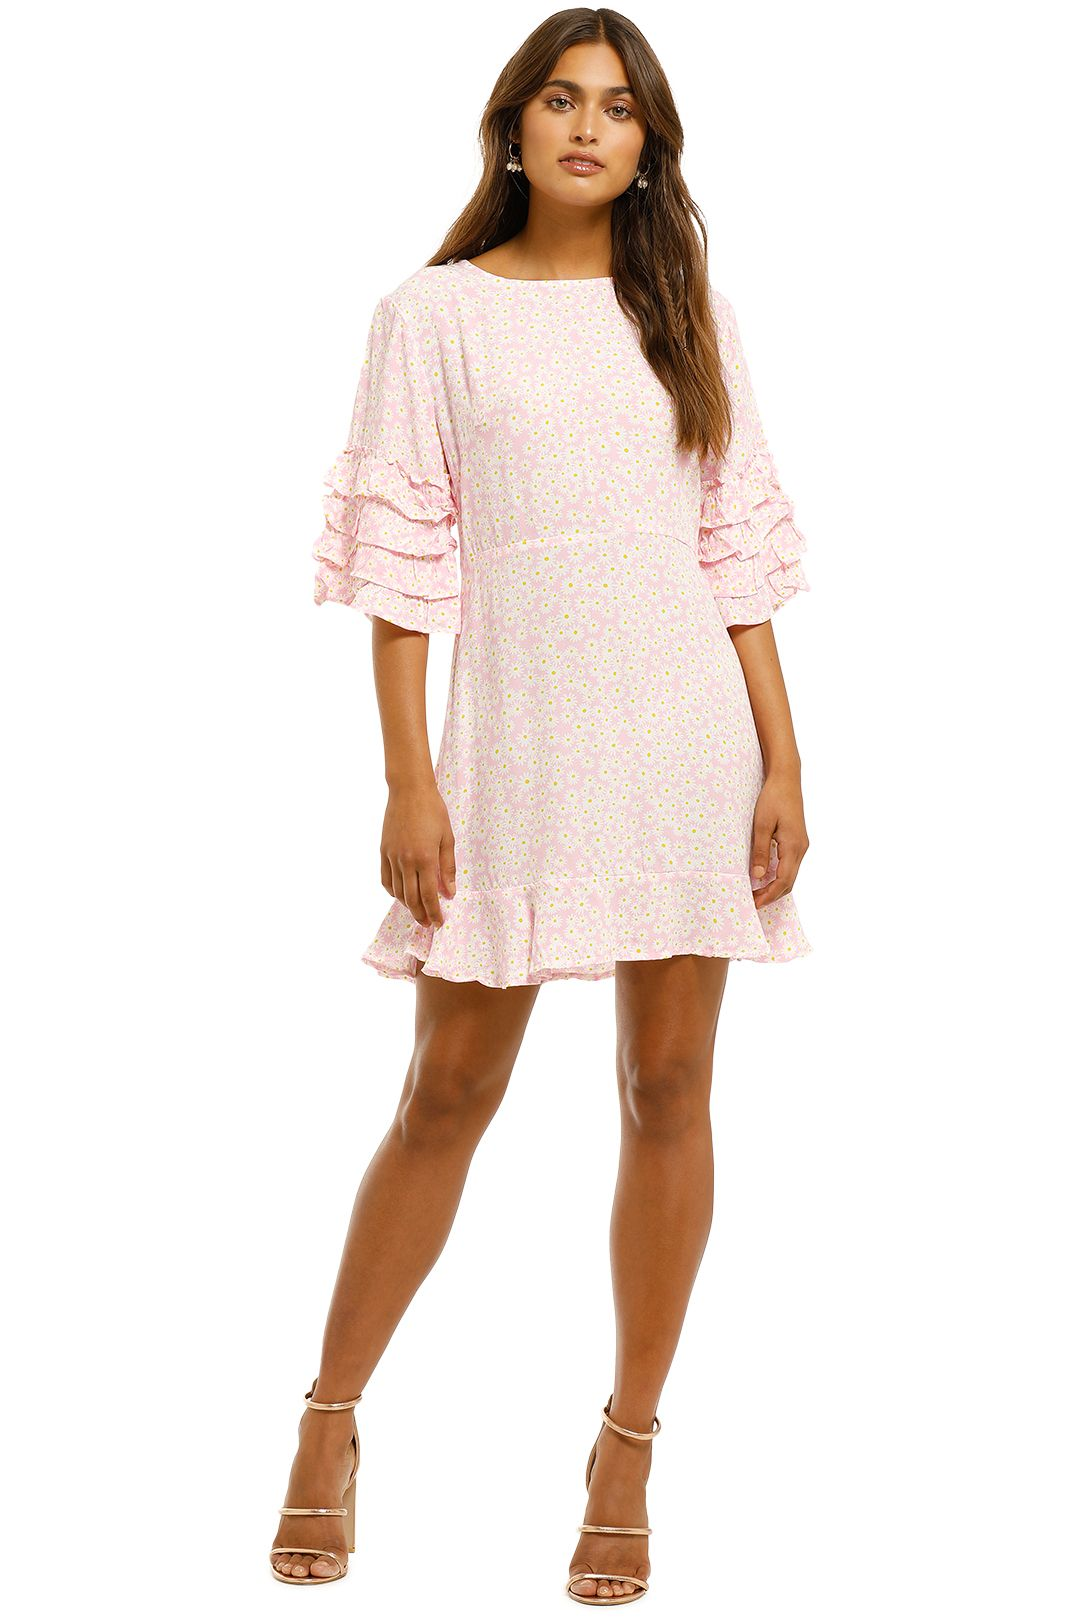 Faithfull-Serafina-Mini-Dress-Dusty-Floral-Print-Front